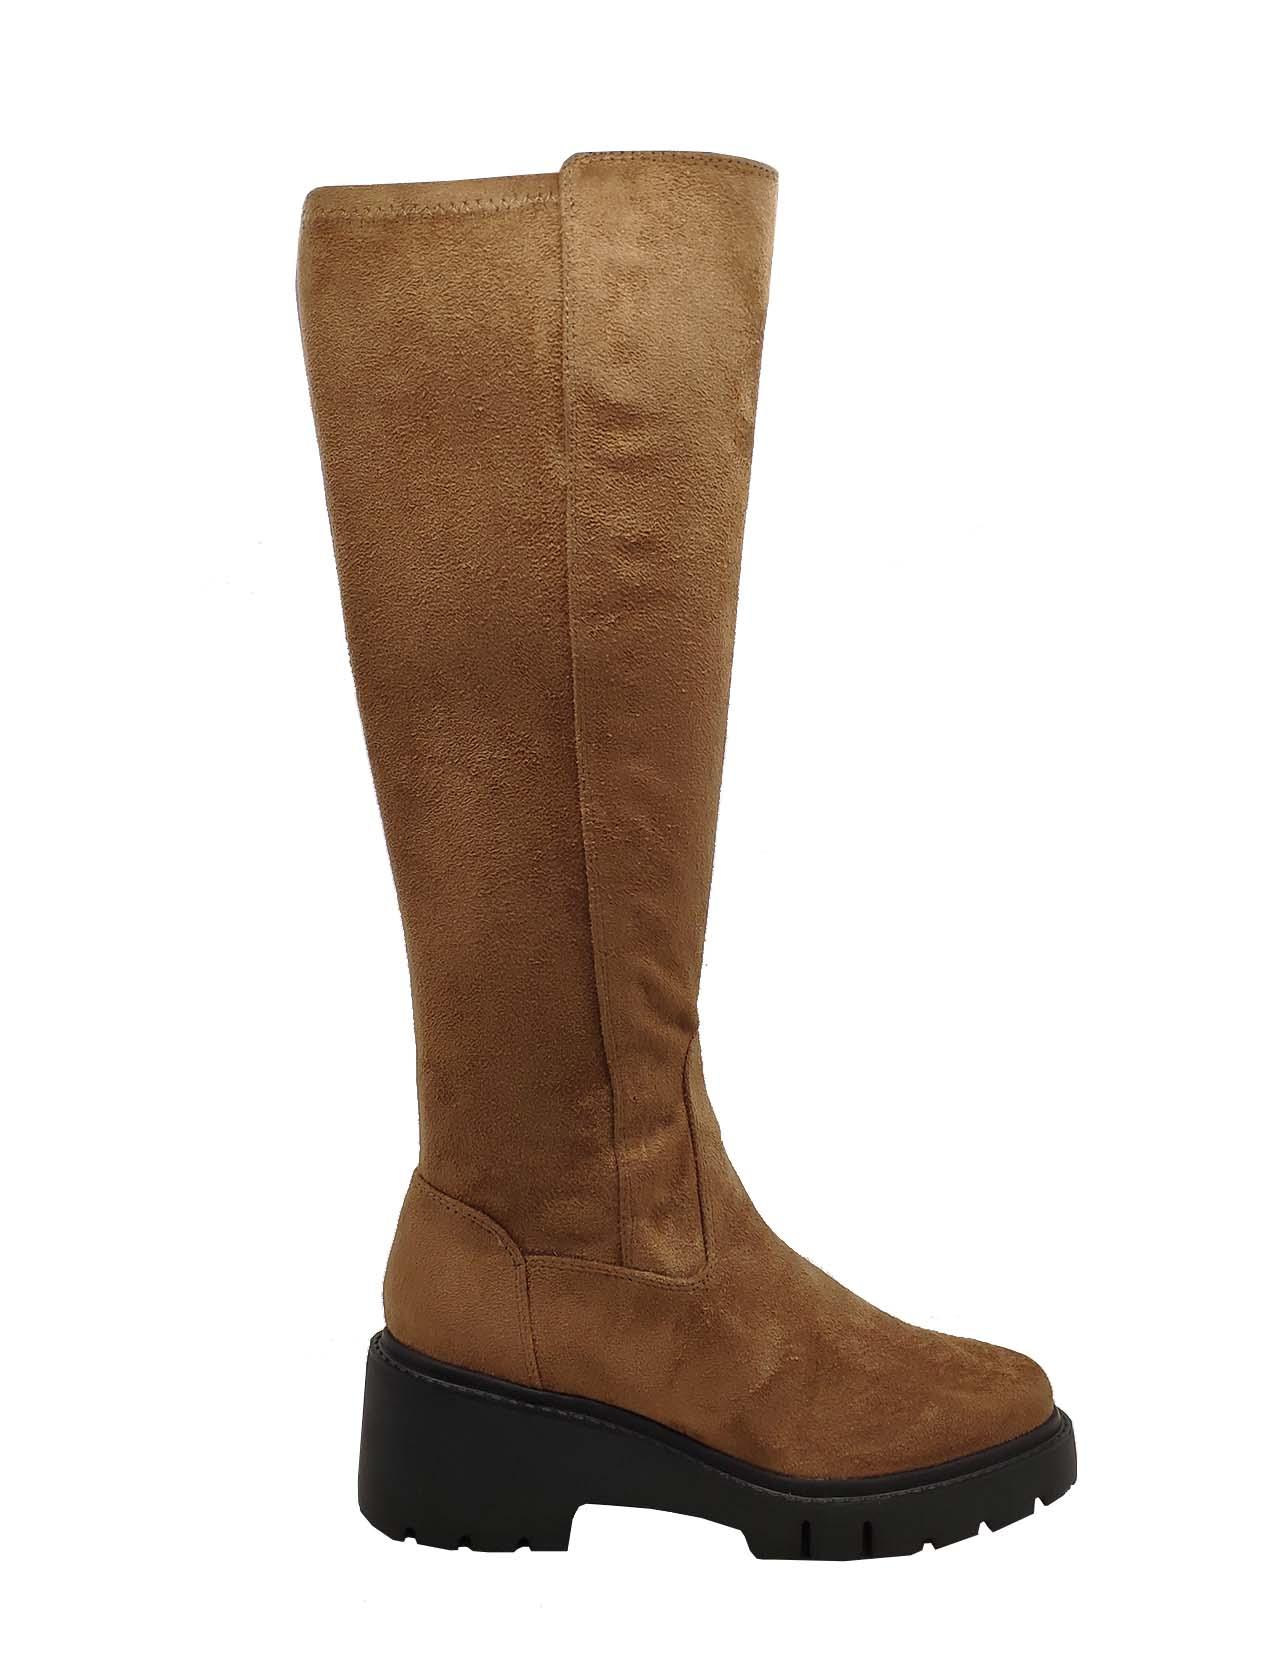 Wedge Boots Woman Unisa | Boots | JELIZACUOIO